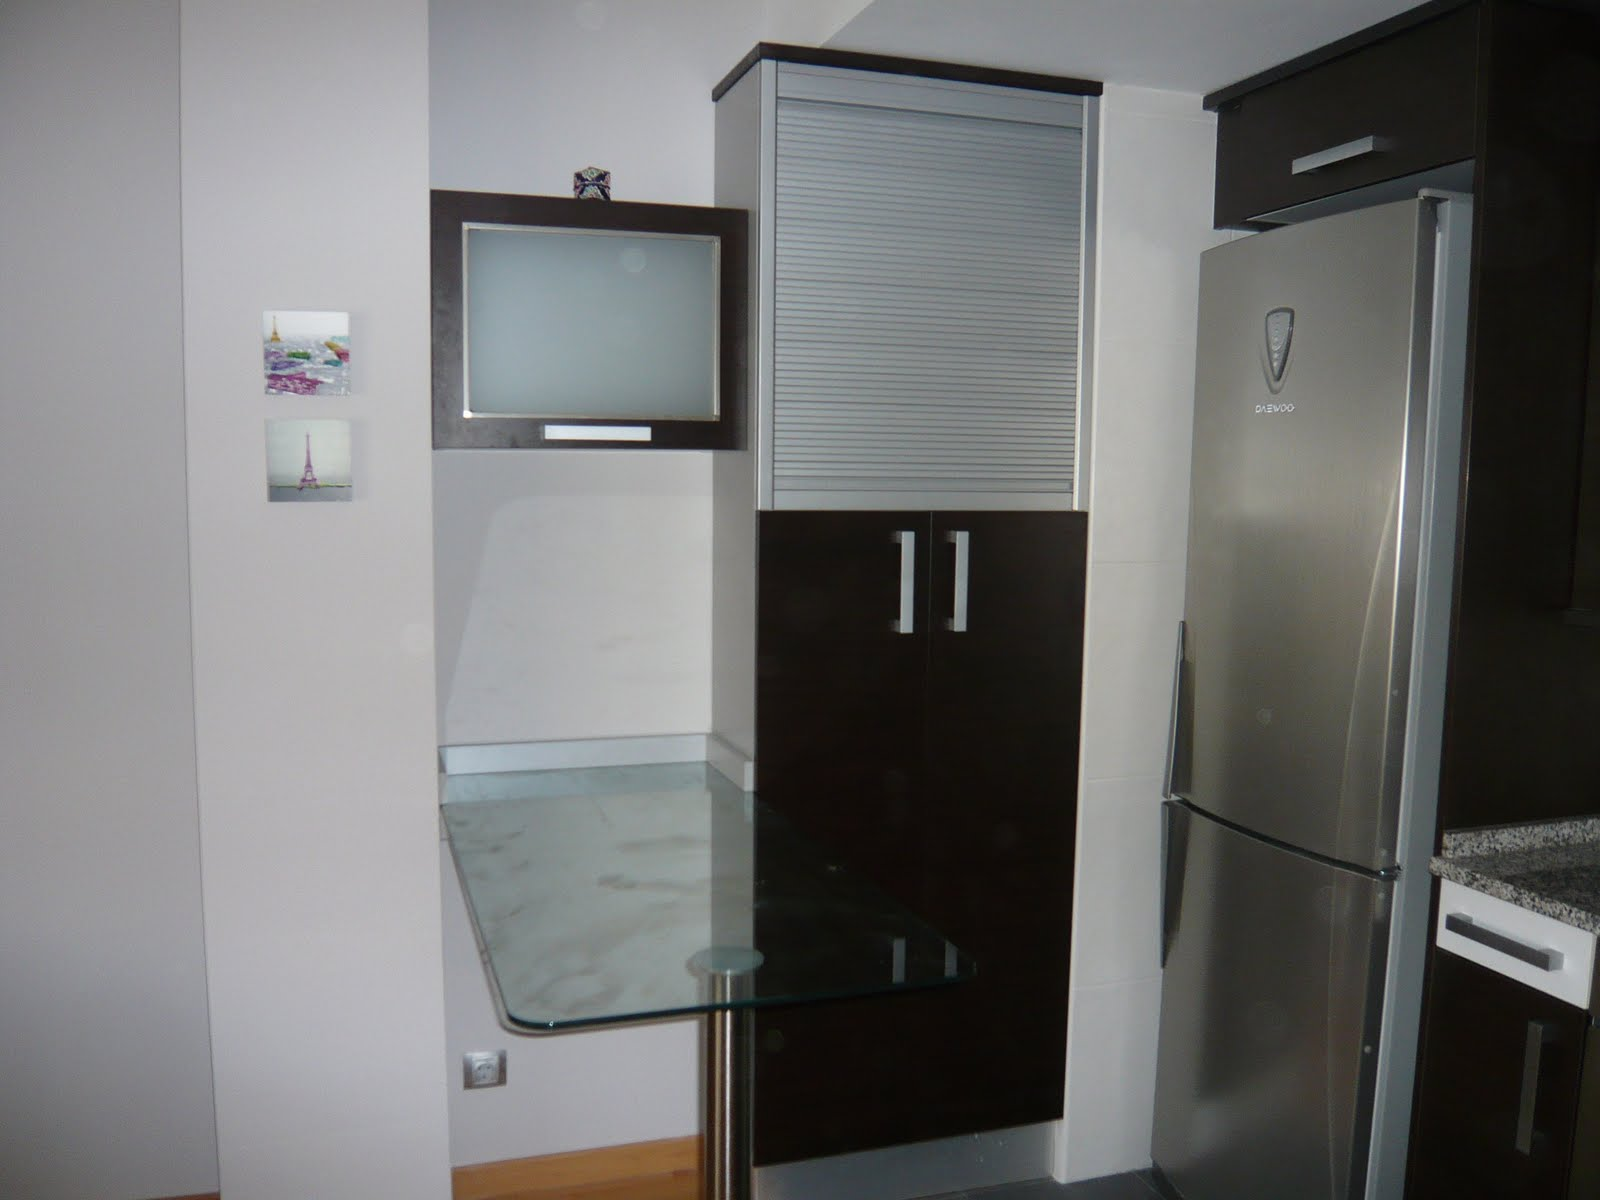 Reuscuina ampliacion muebles de cocina - Persiana mueble cocina ...